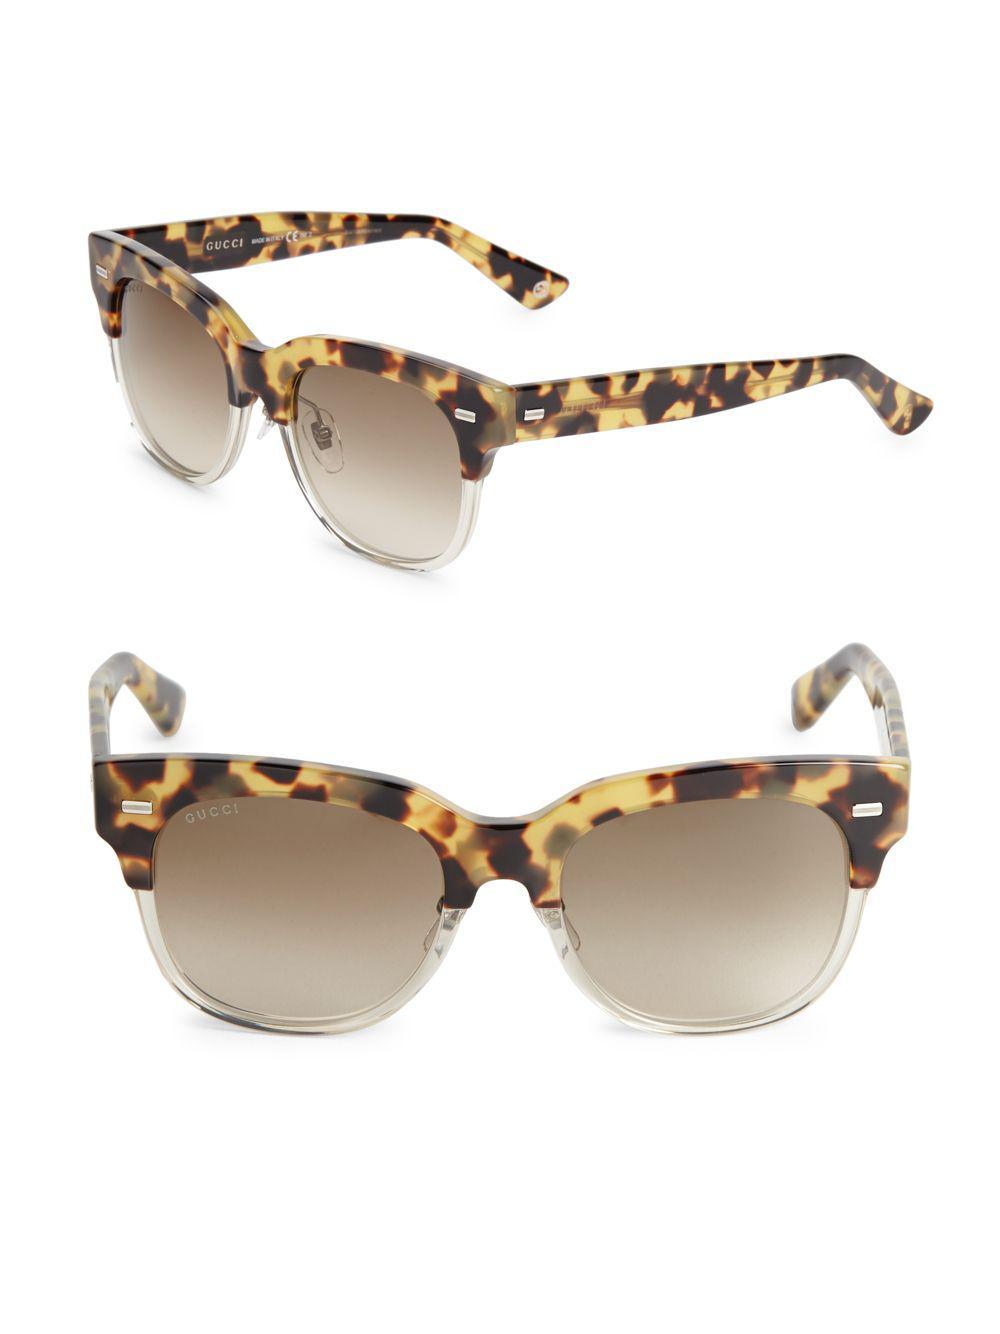 b7bb6ecf364 Lyst - Gucci 52mm Wayfarer Leopard Sunglasses in Brown